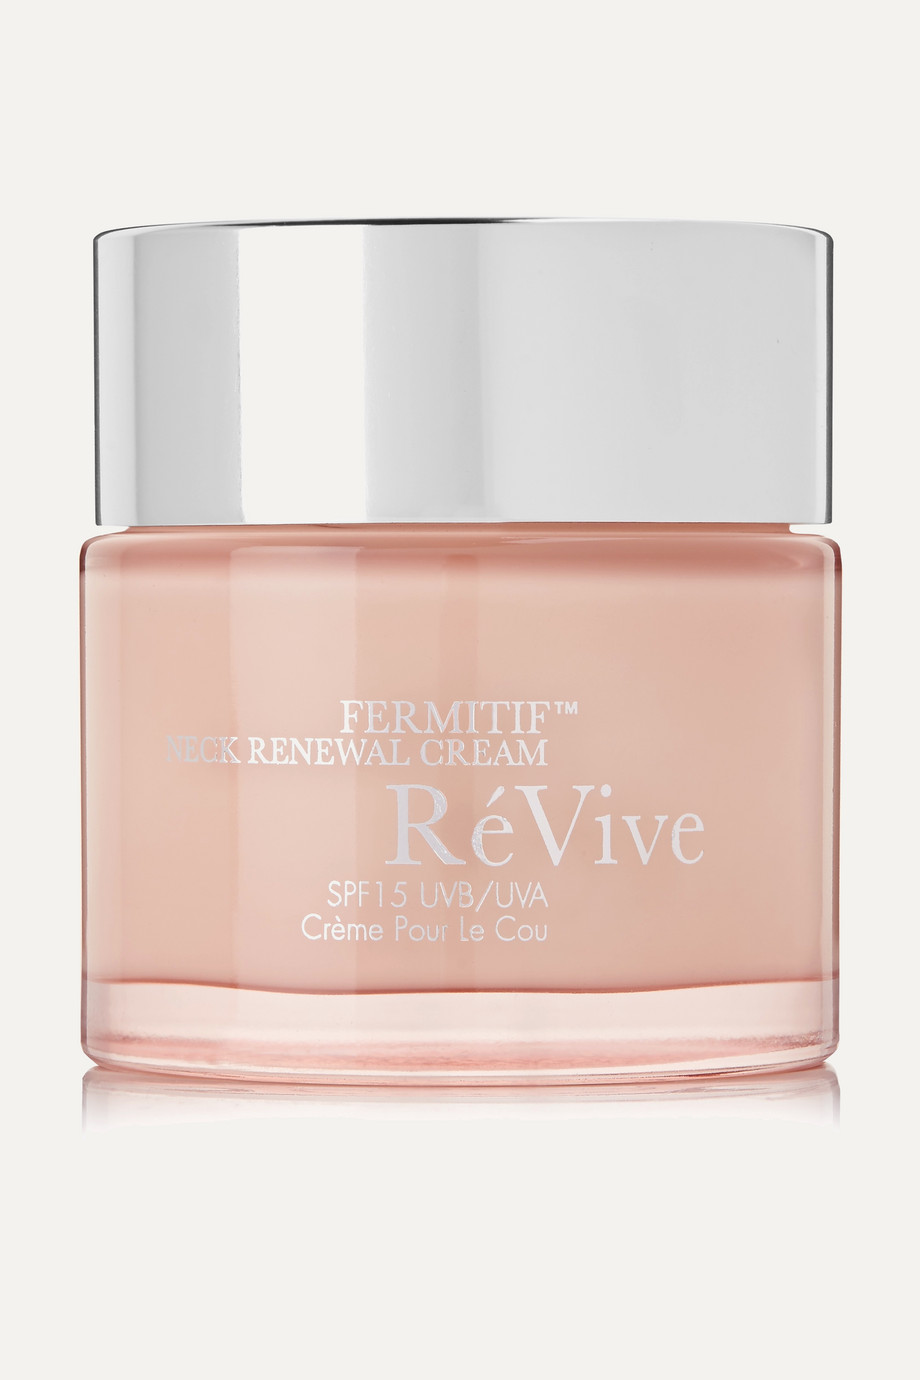 RéVive Fermitif Neck Renewal Cream SPF15, 75ml